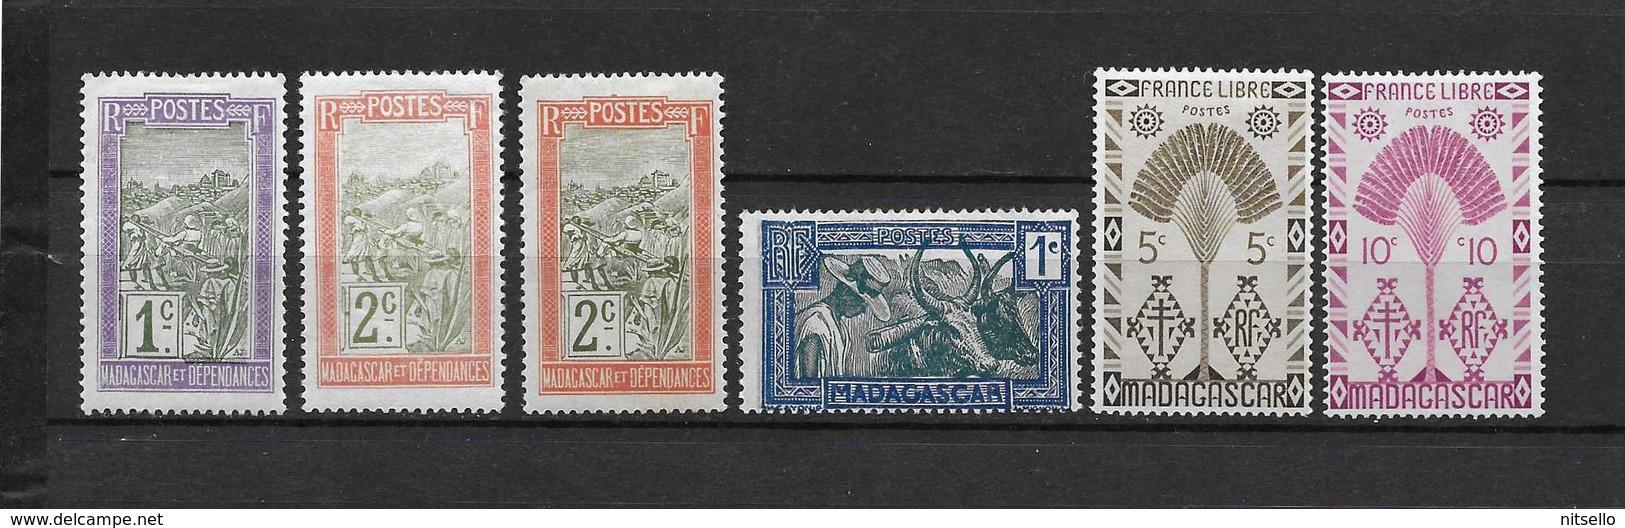 LOTE 1716  ///  MADAGASCAR - Madagascar (1960-...)